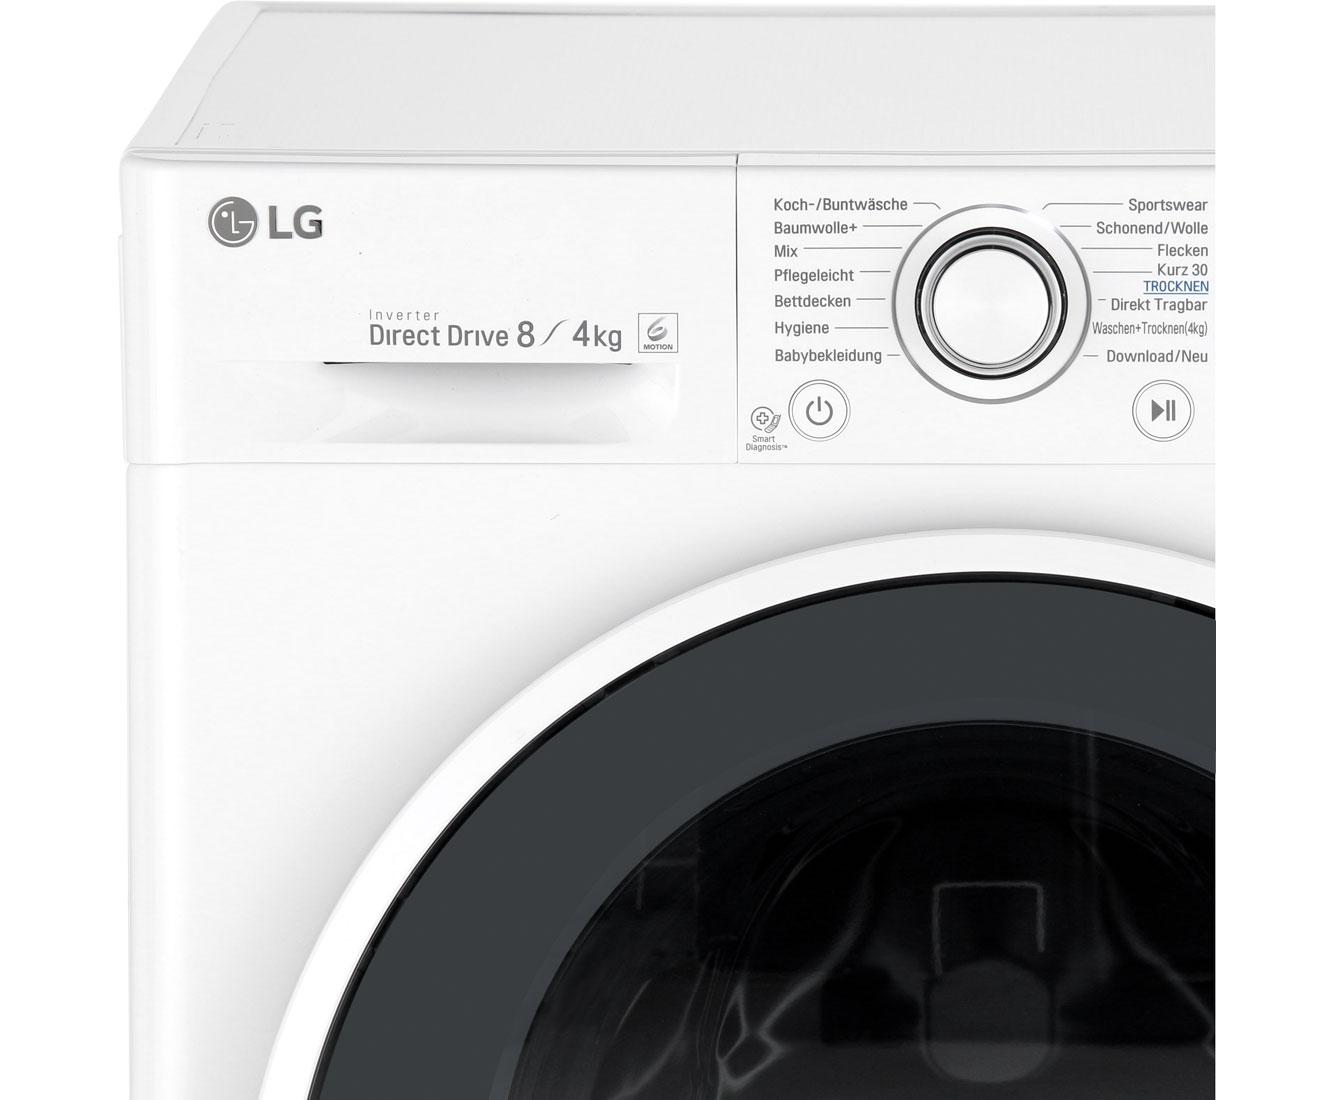 Gallery of lg waschtrockner mit 6 motion direct drive technologie 7